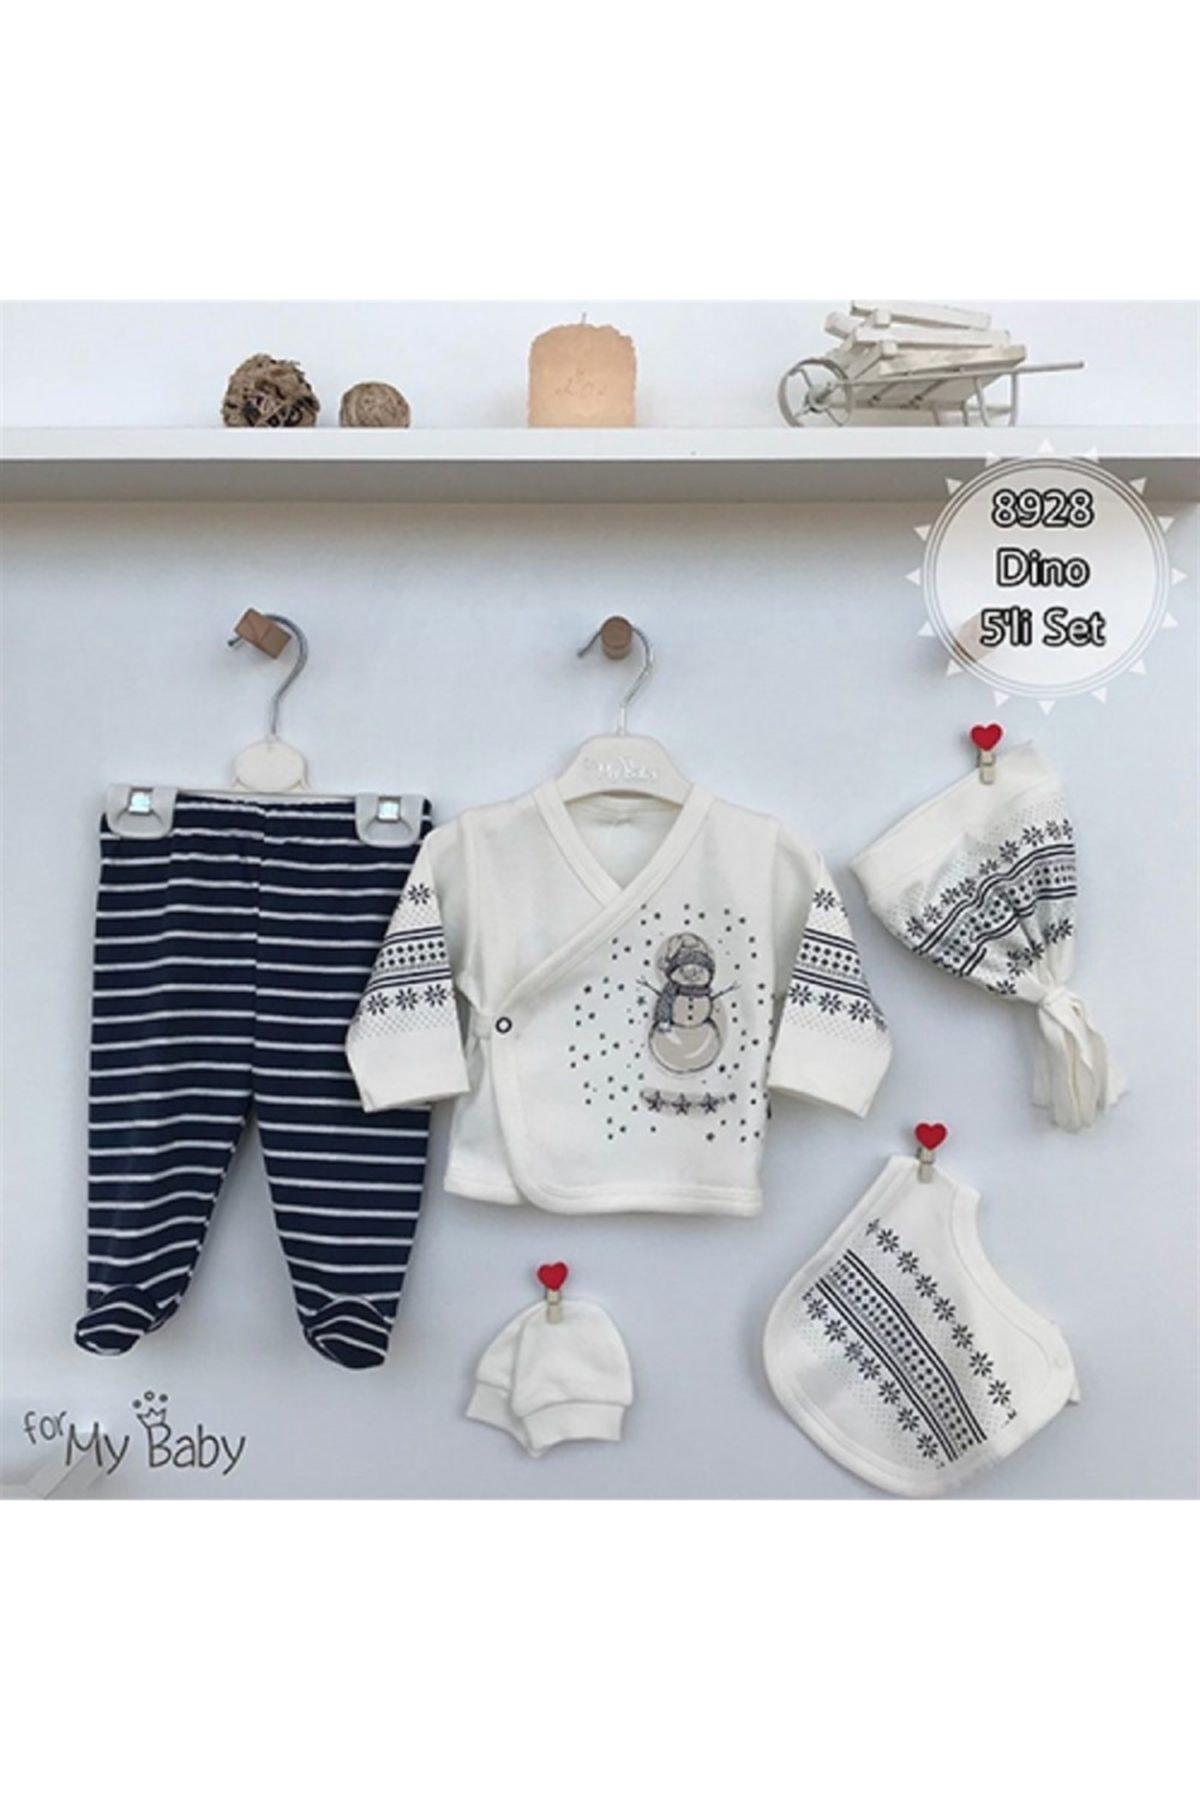 For My Baby 8928 Dino Erkek Bebek 5'li Hastane Çıkış Seti 1